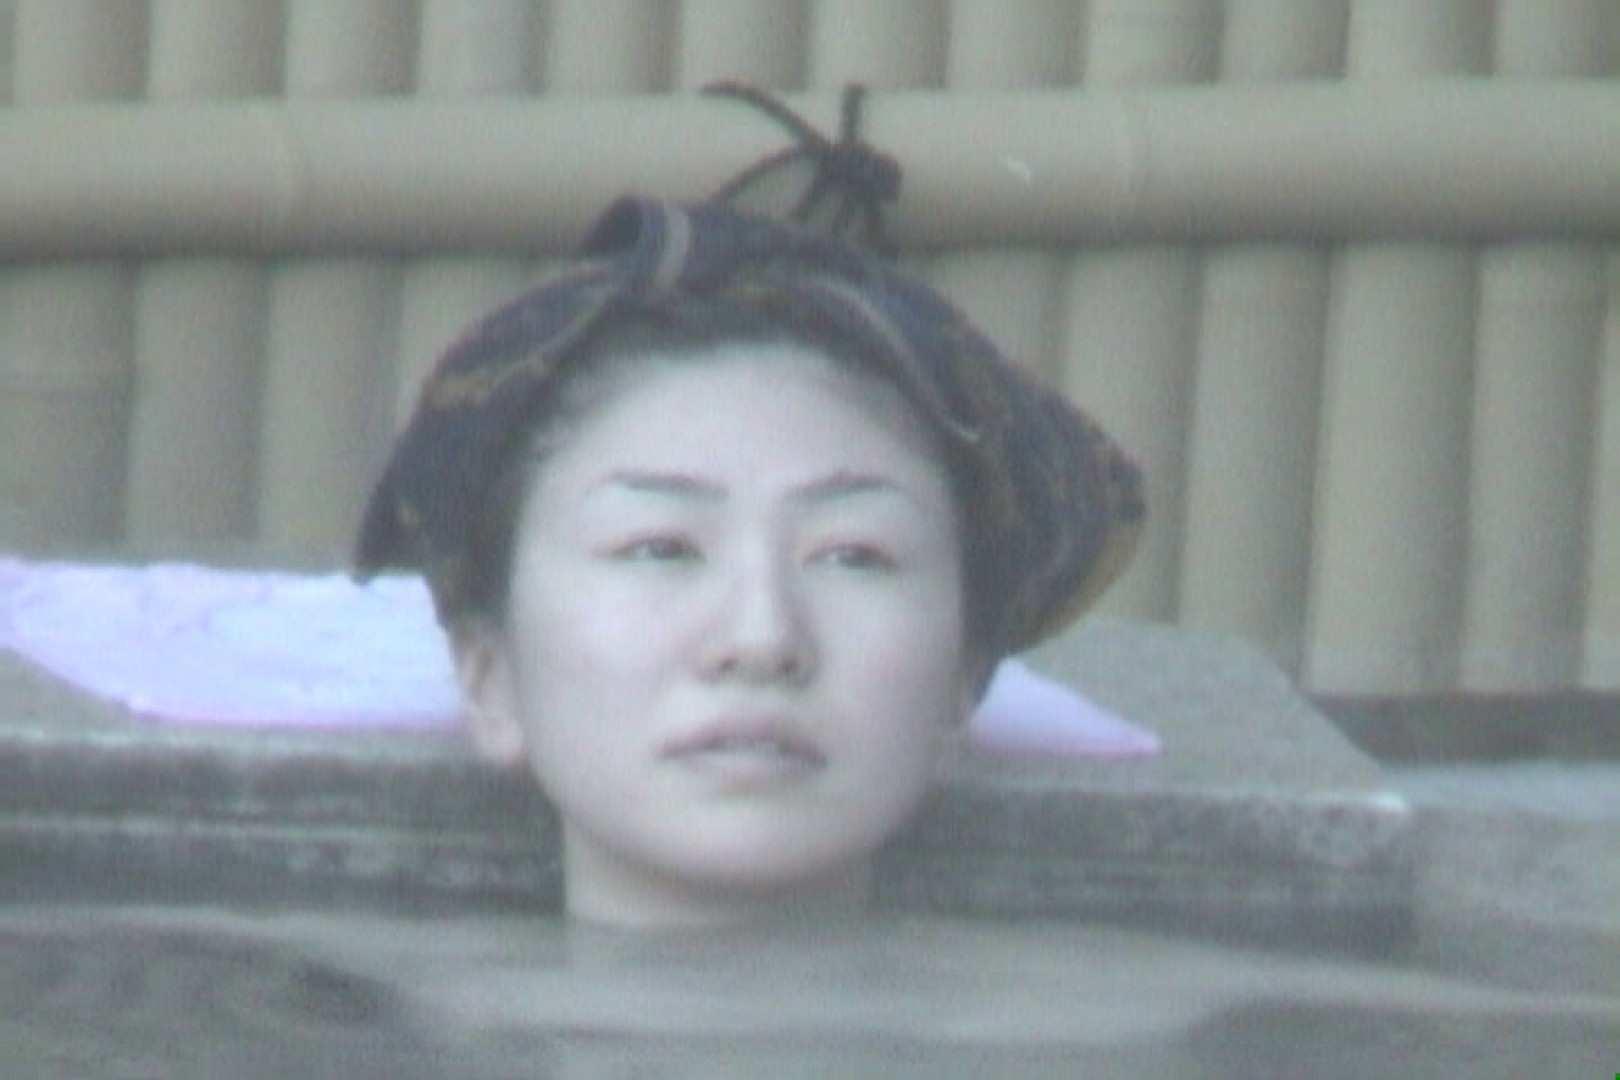 Aquaな露天風呂Vol.607 盗撮シリーズ | 露天風呂編  107PIX 101